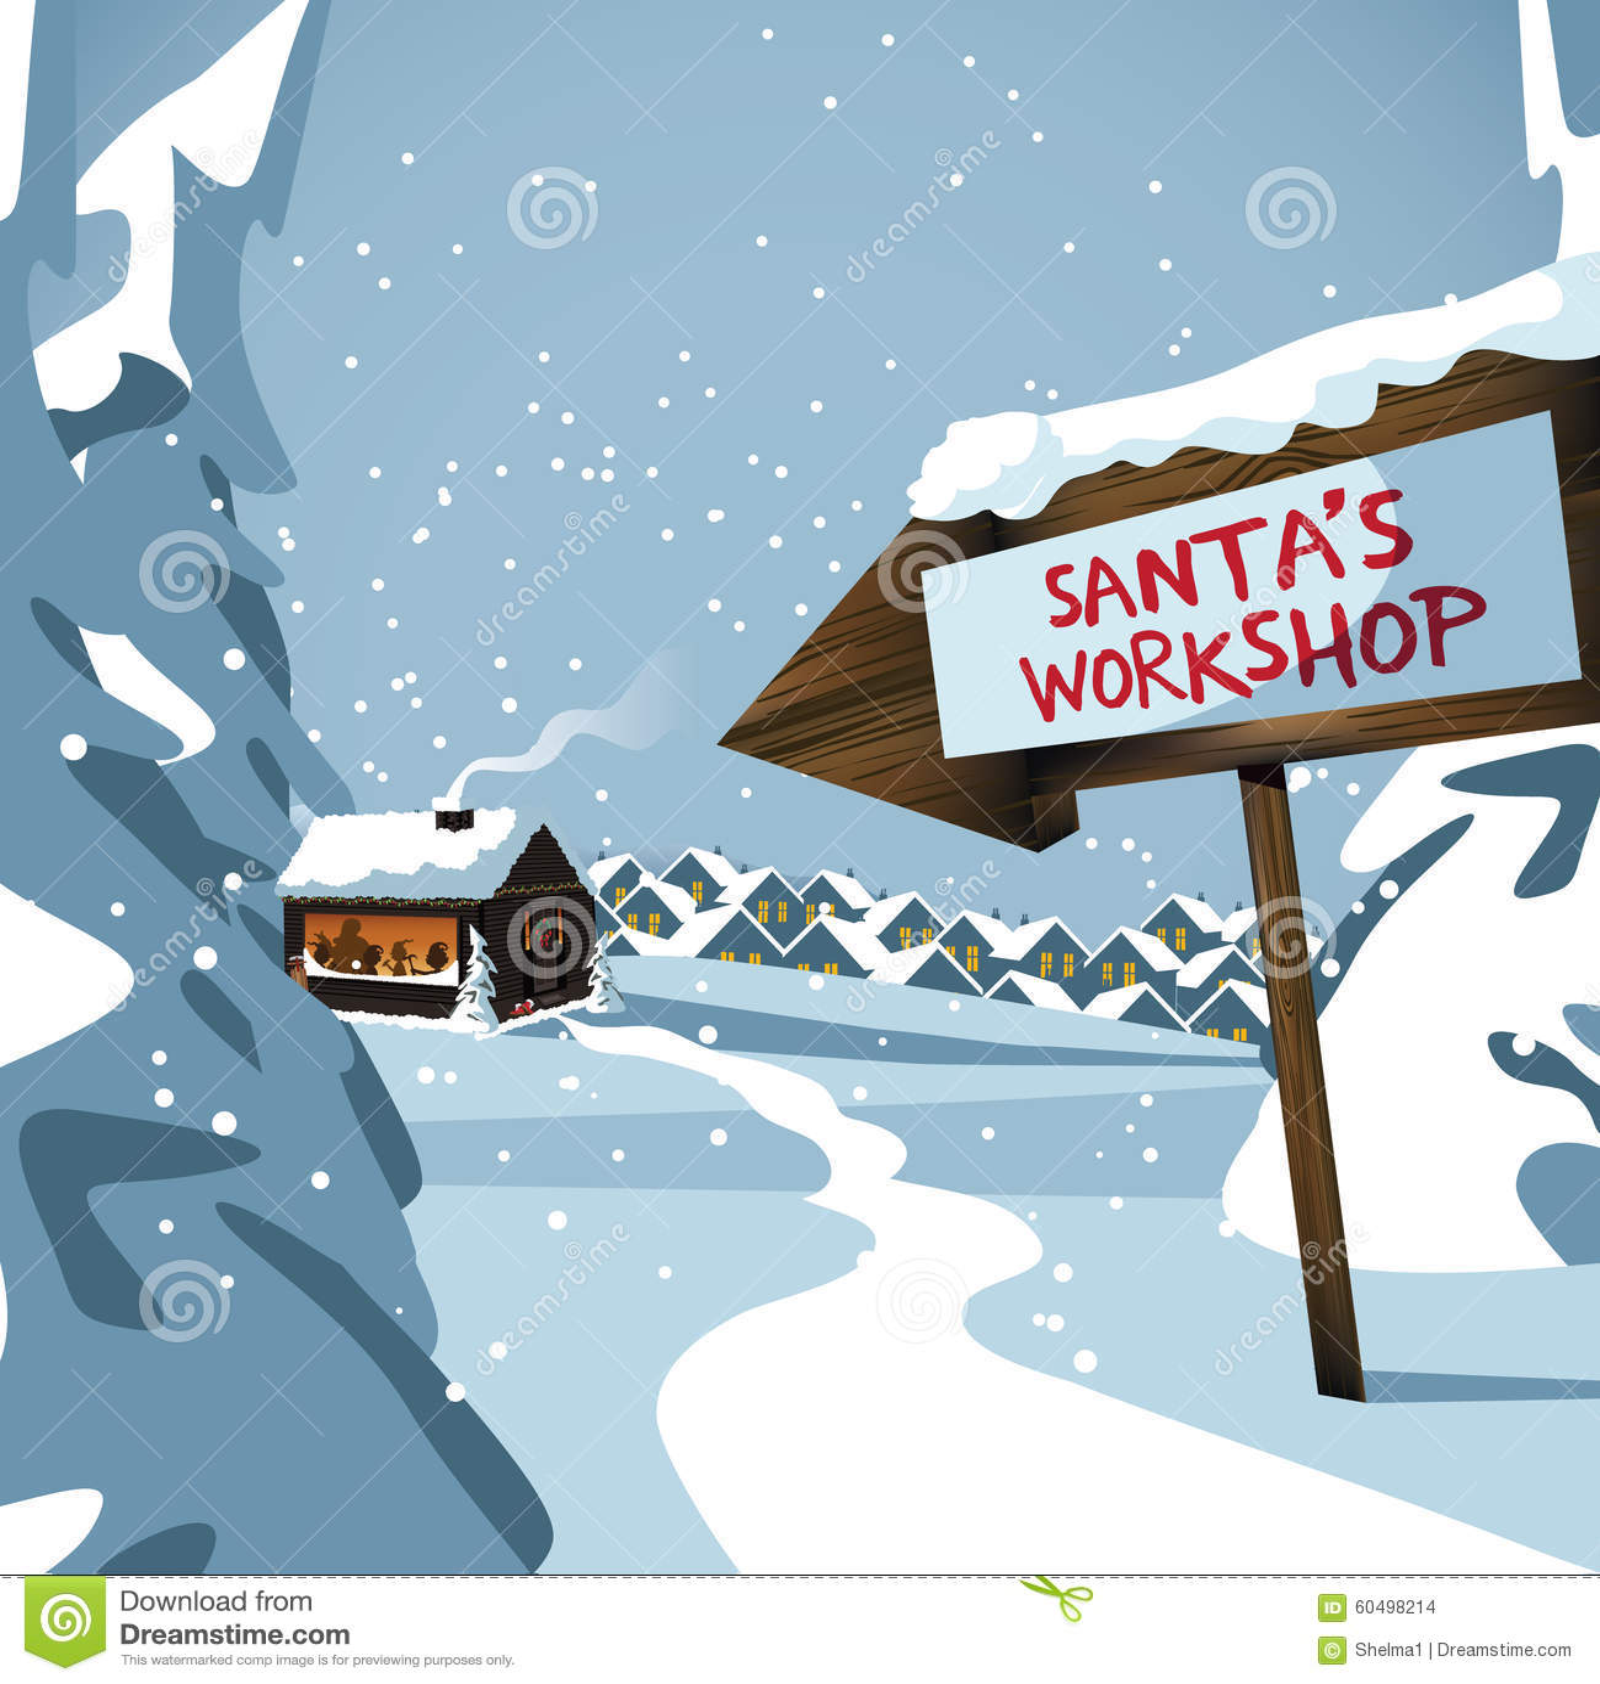 Santa s workshop at the north pole